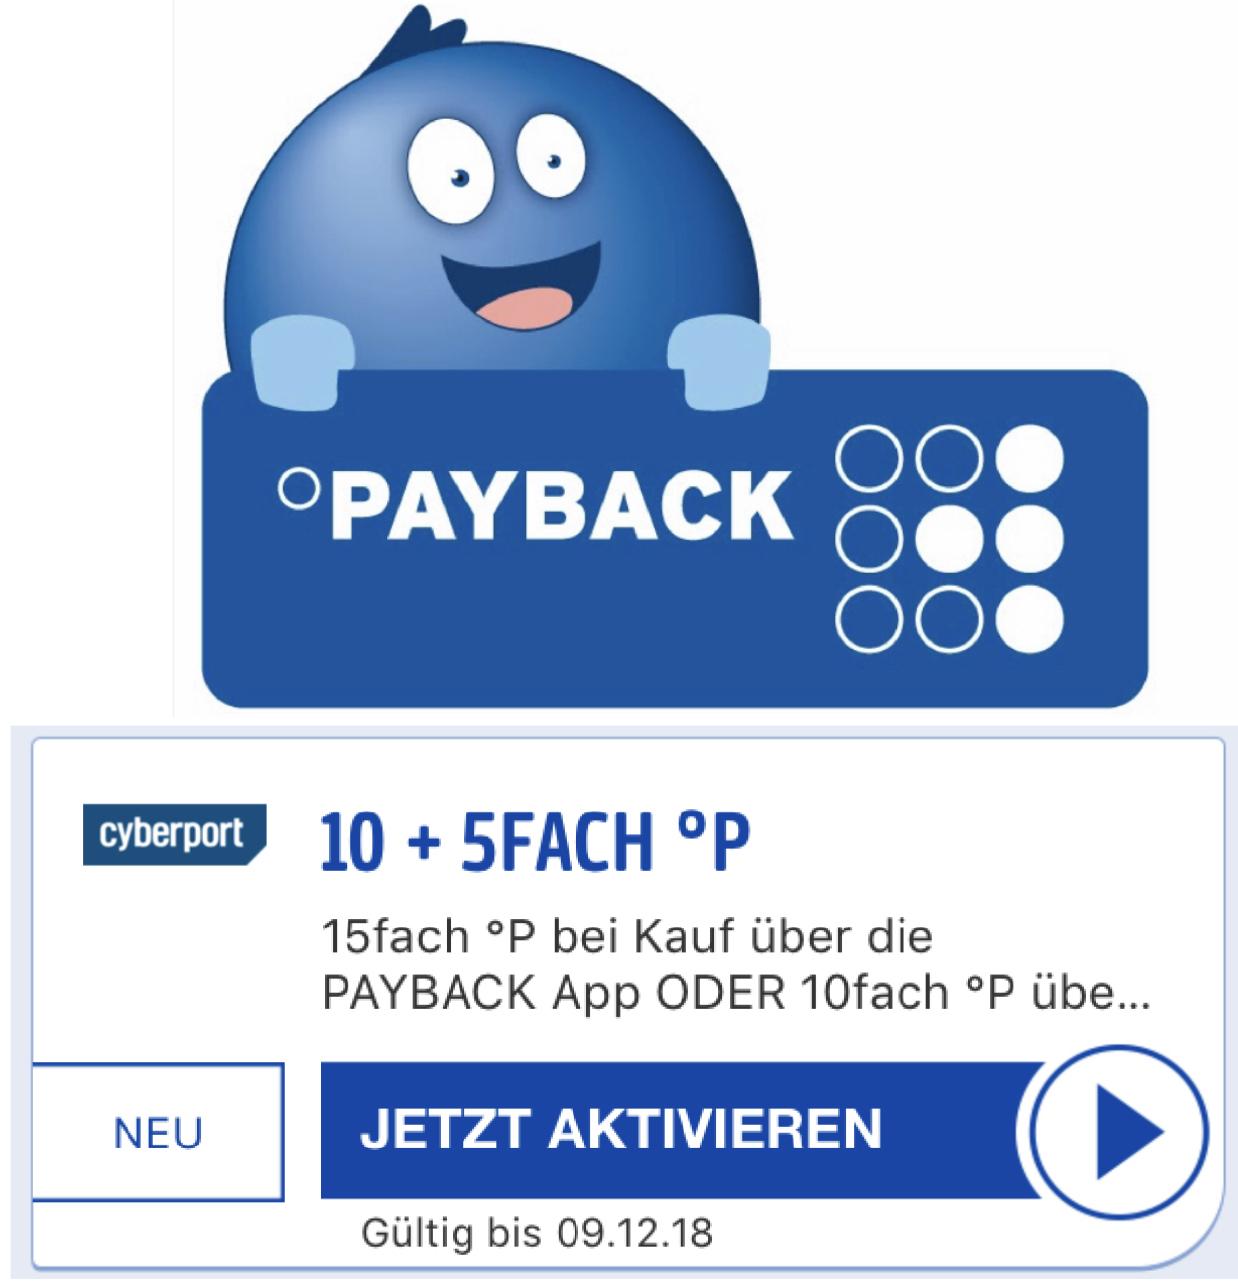 cyperport 15 fache payback punkte 10 5 fach ber die payback app entspricht 7 5 ersparnis. Black Bedroom Furniture Sets. Home Design Ideas